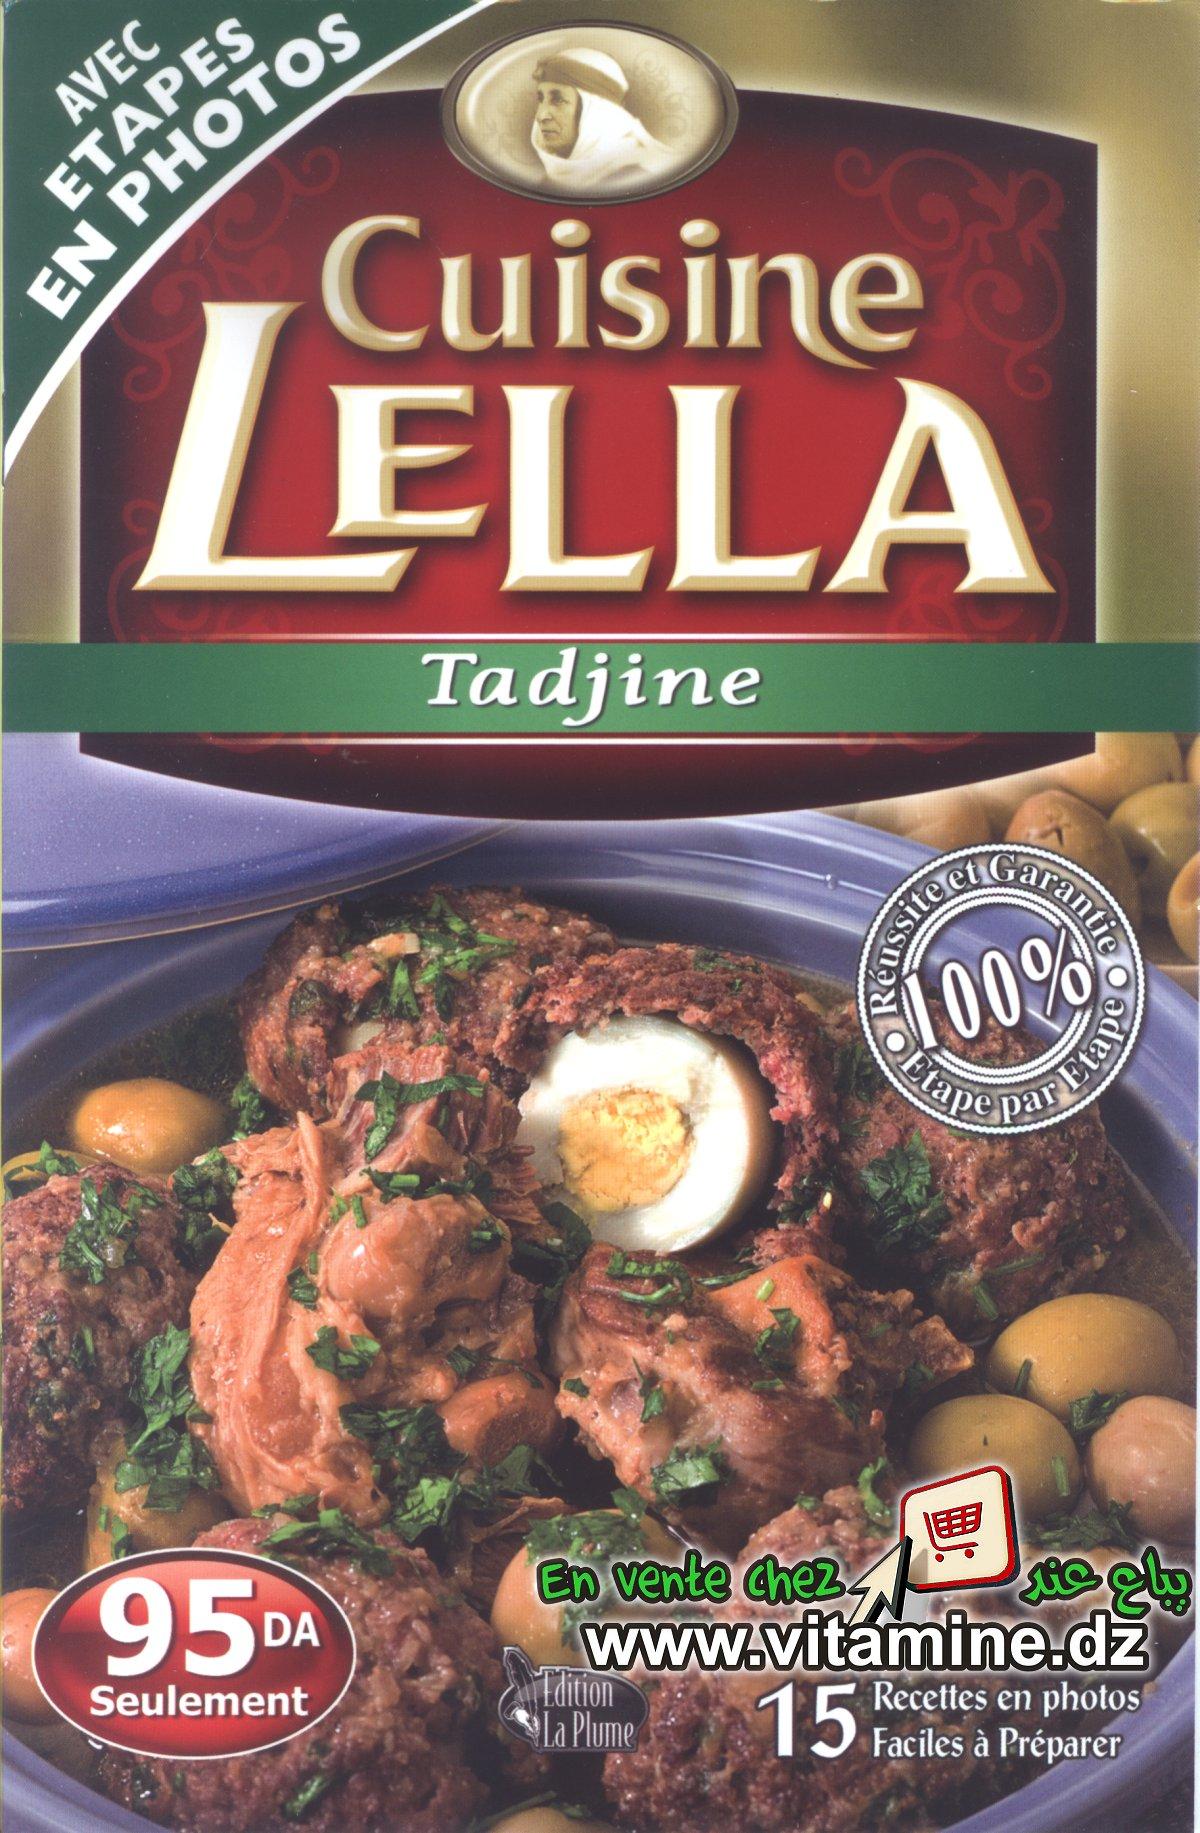 Cuisine Lella - Tadjine